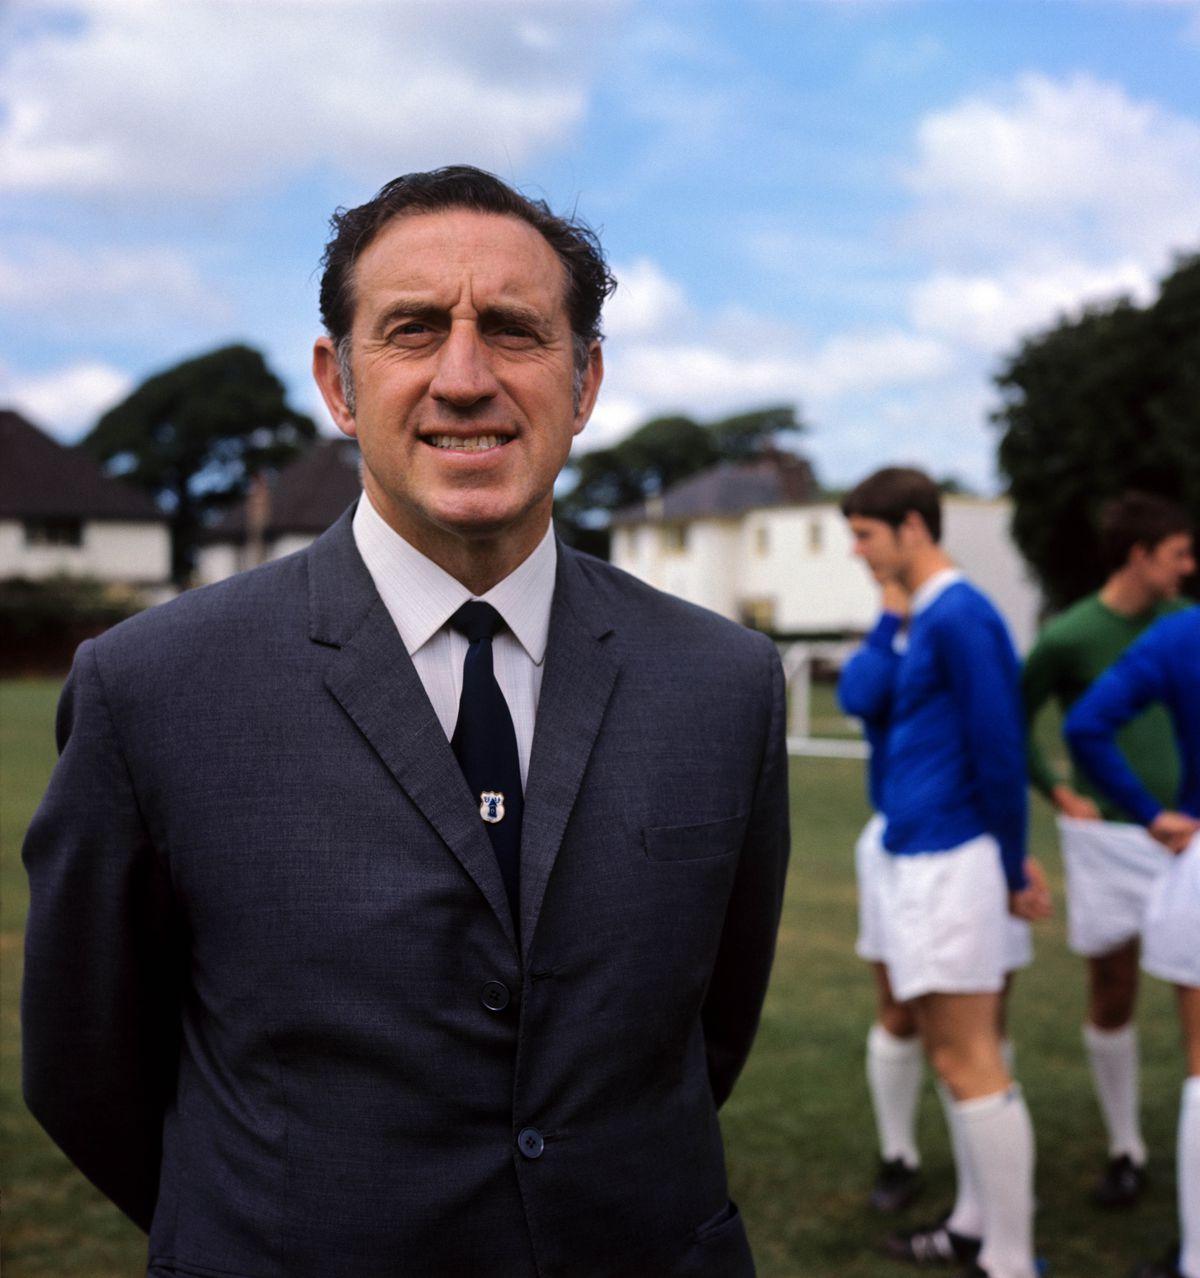 Soccer - Football League Division One - Everton Photocall